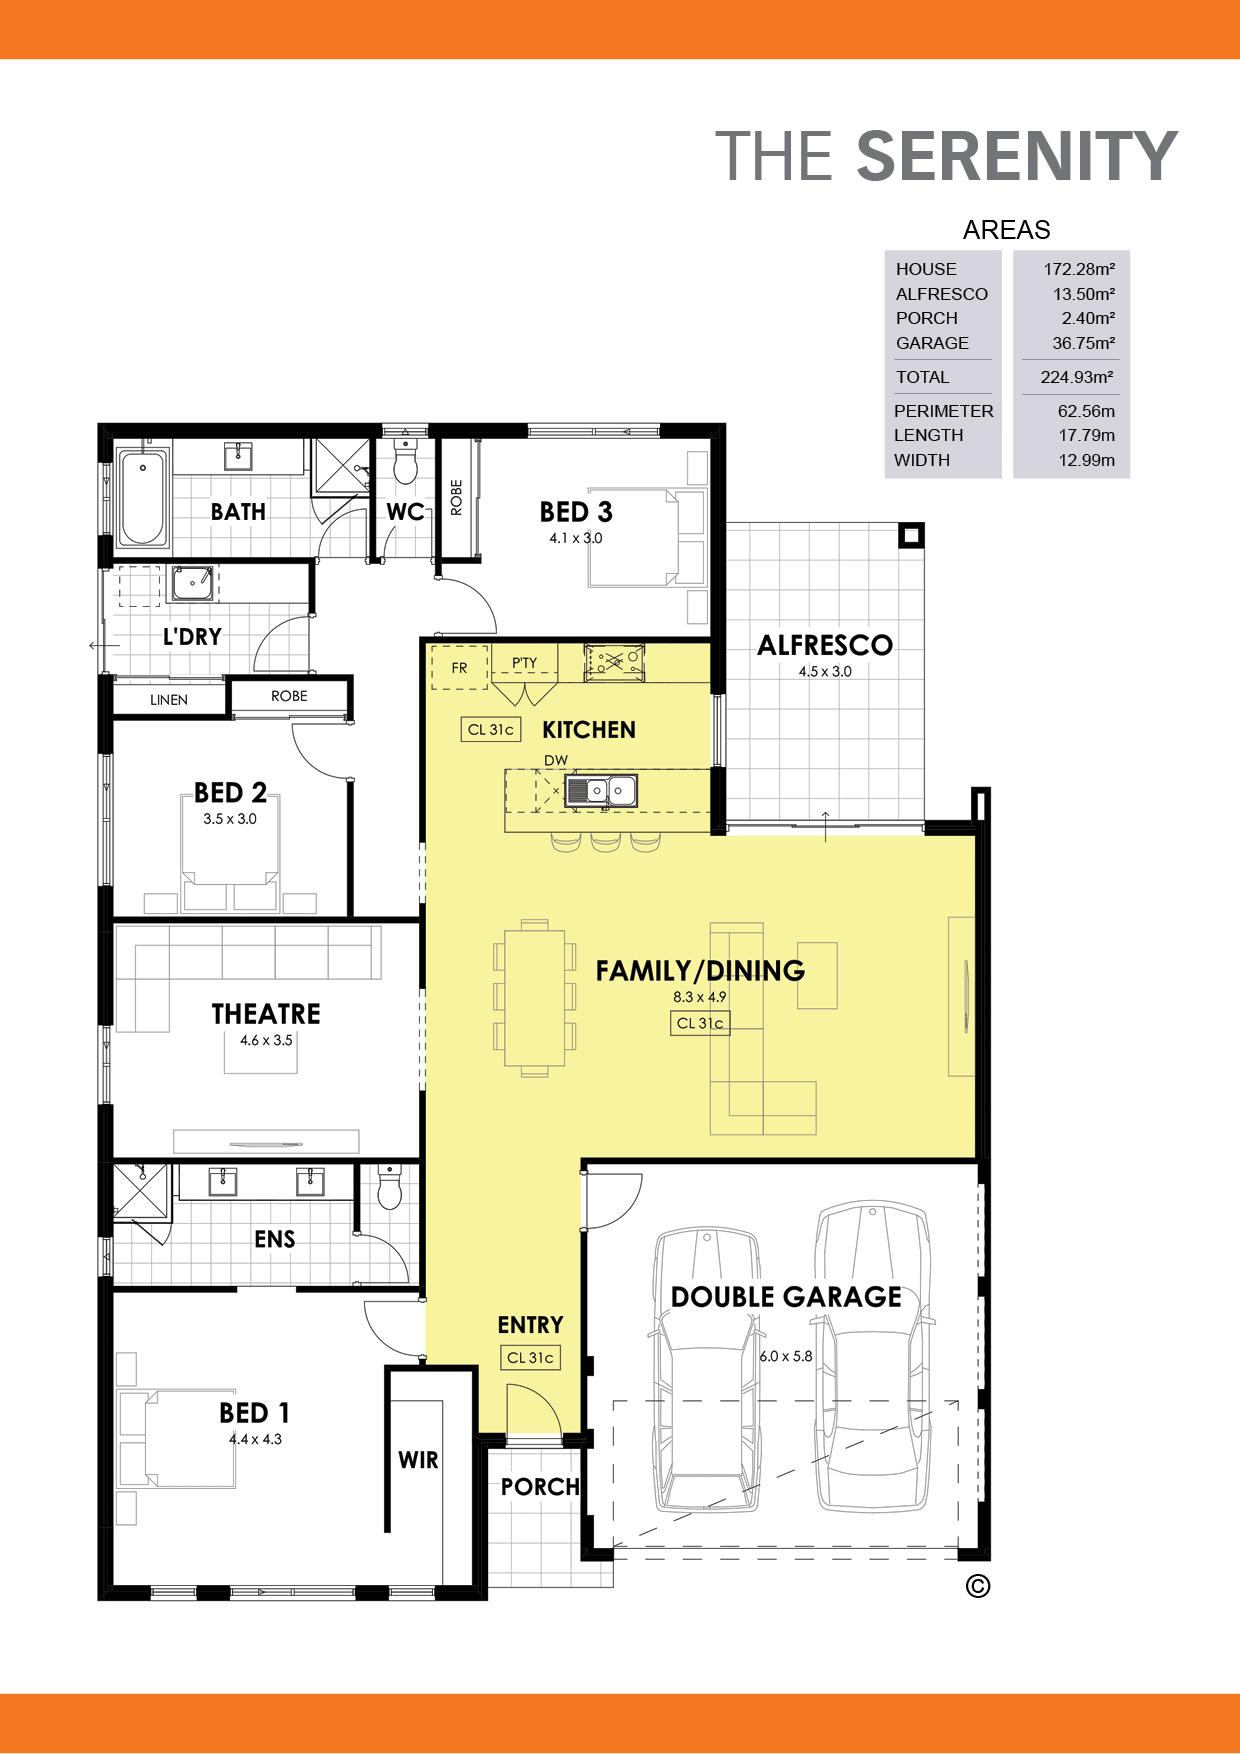 The Serenity Floorplan